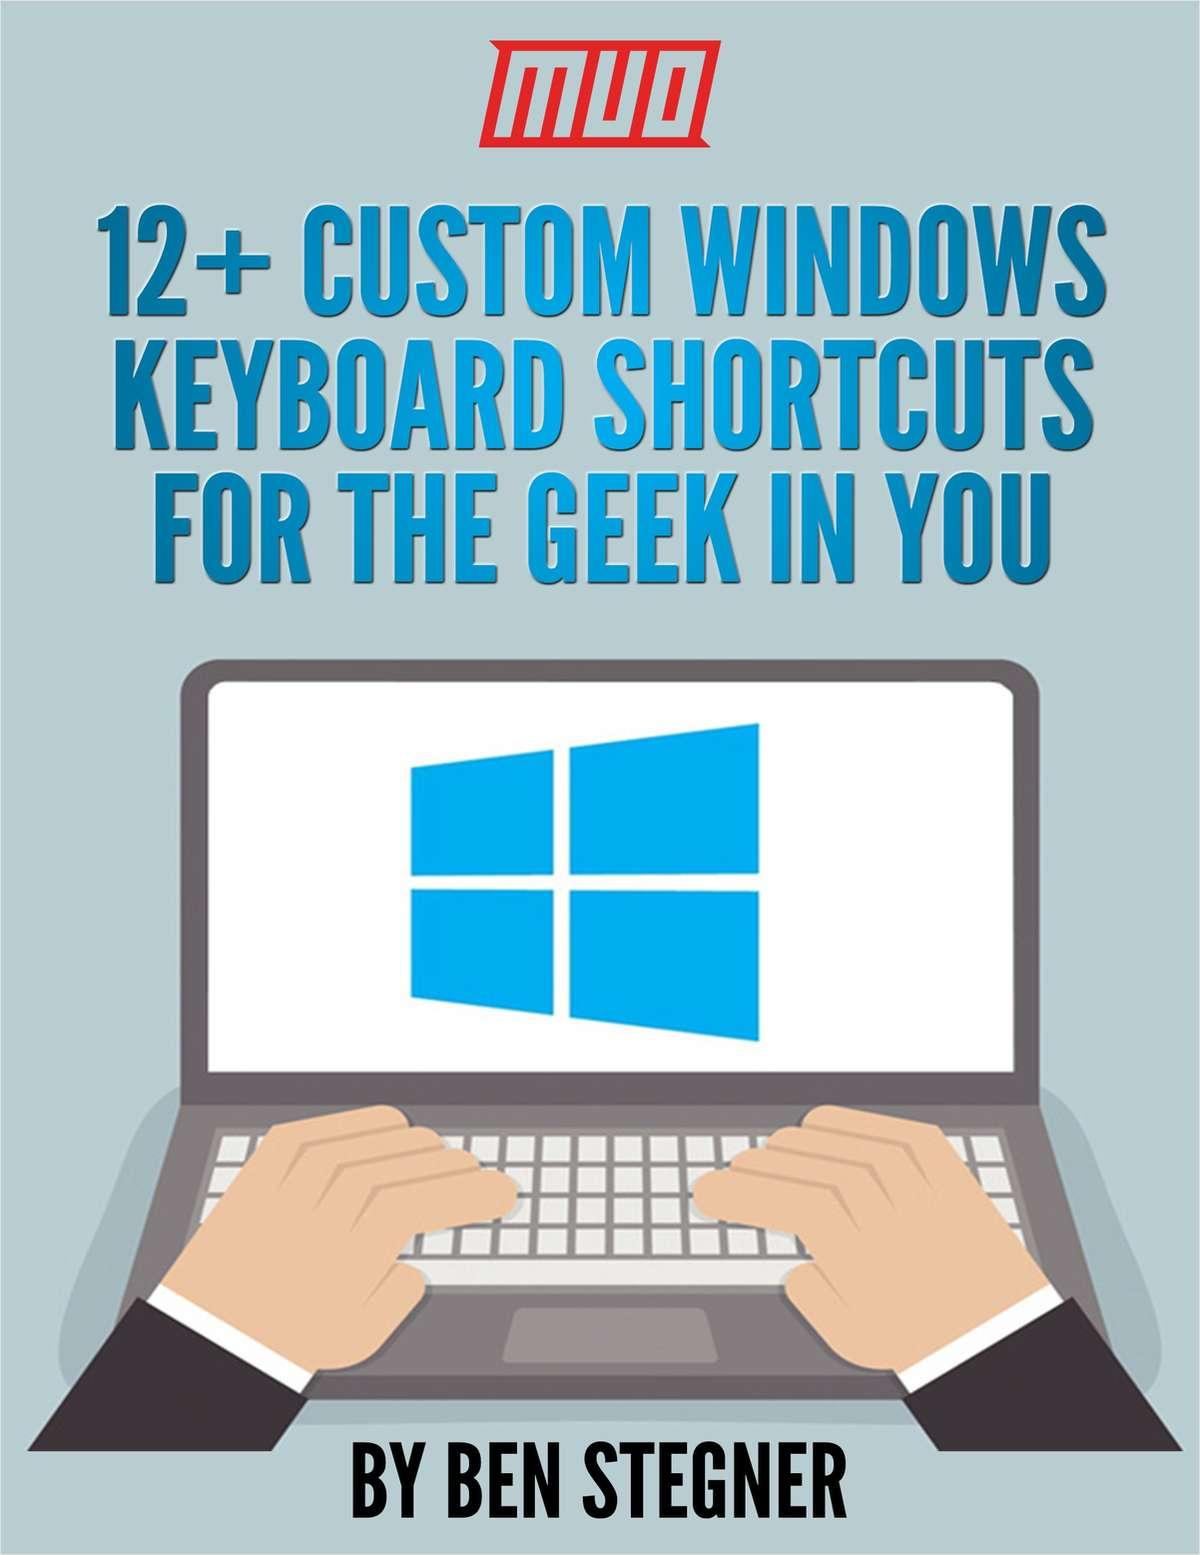 12+ Custom Windows Keyboard Shortcuts for the Geek in You